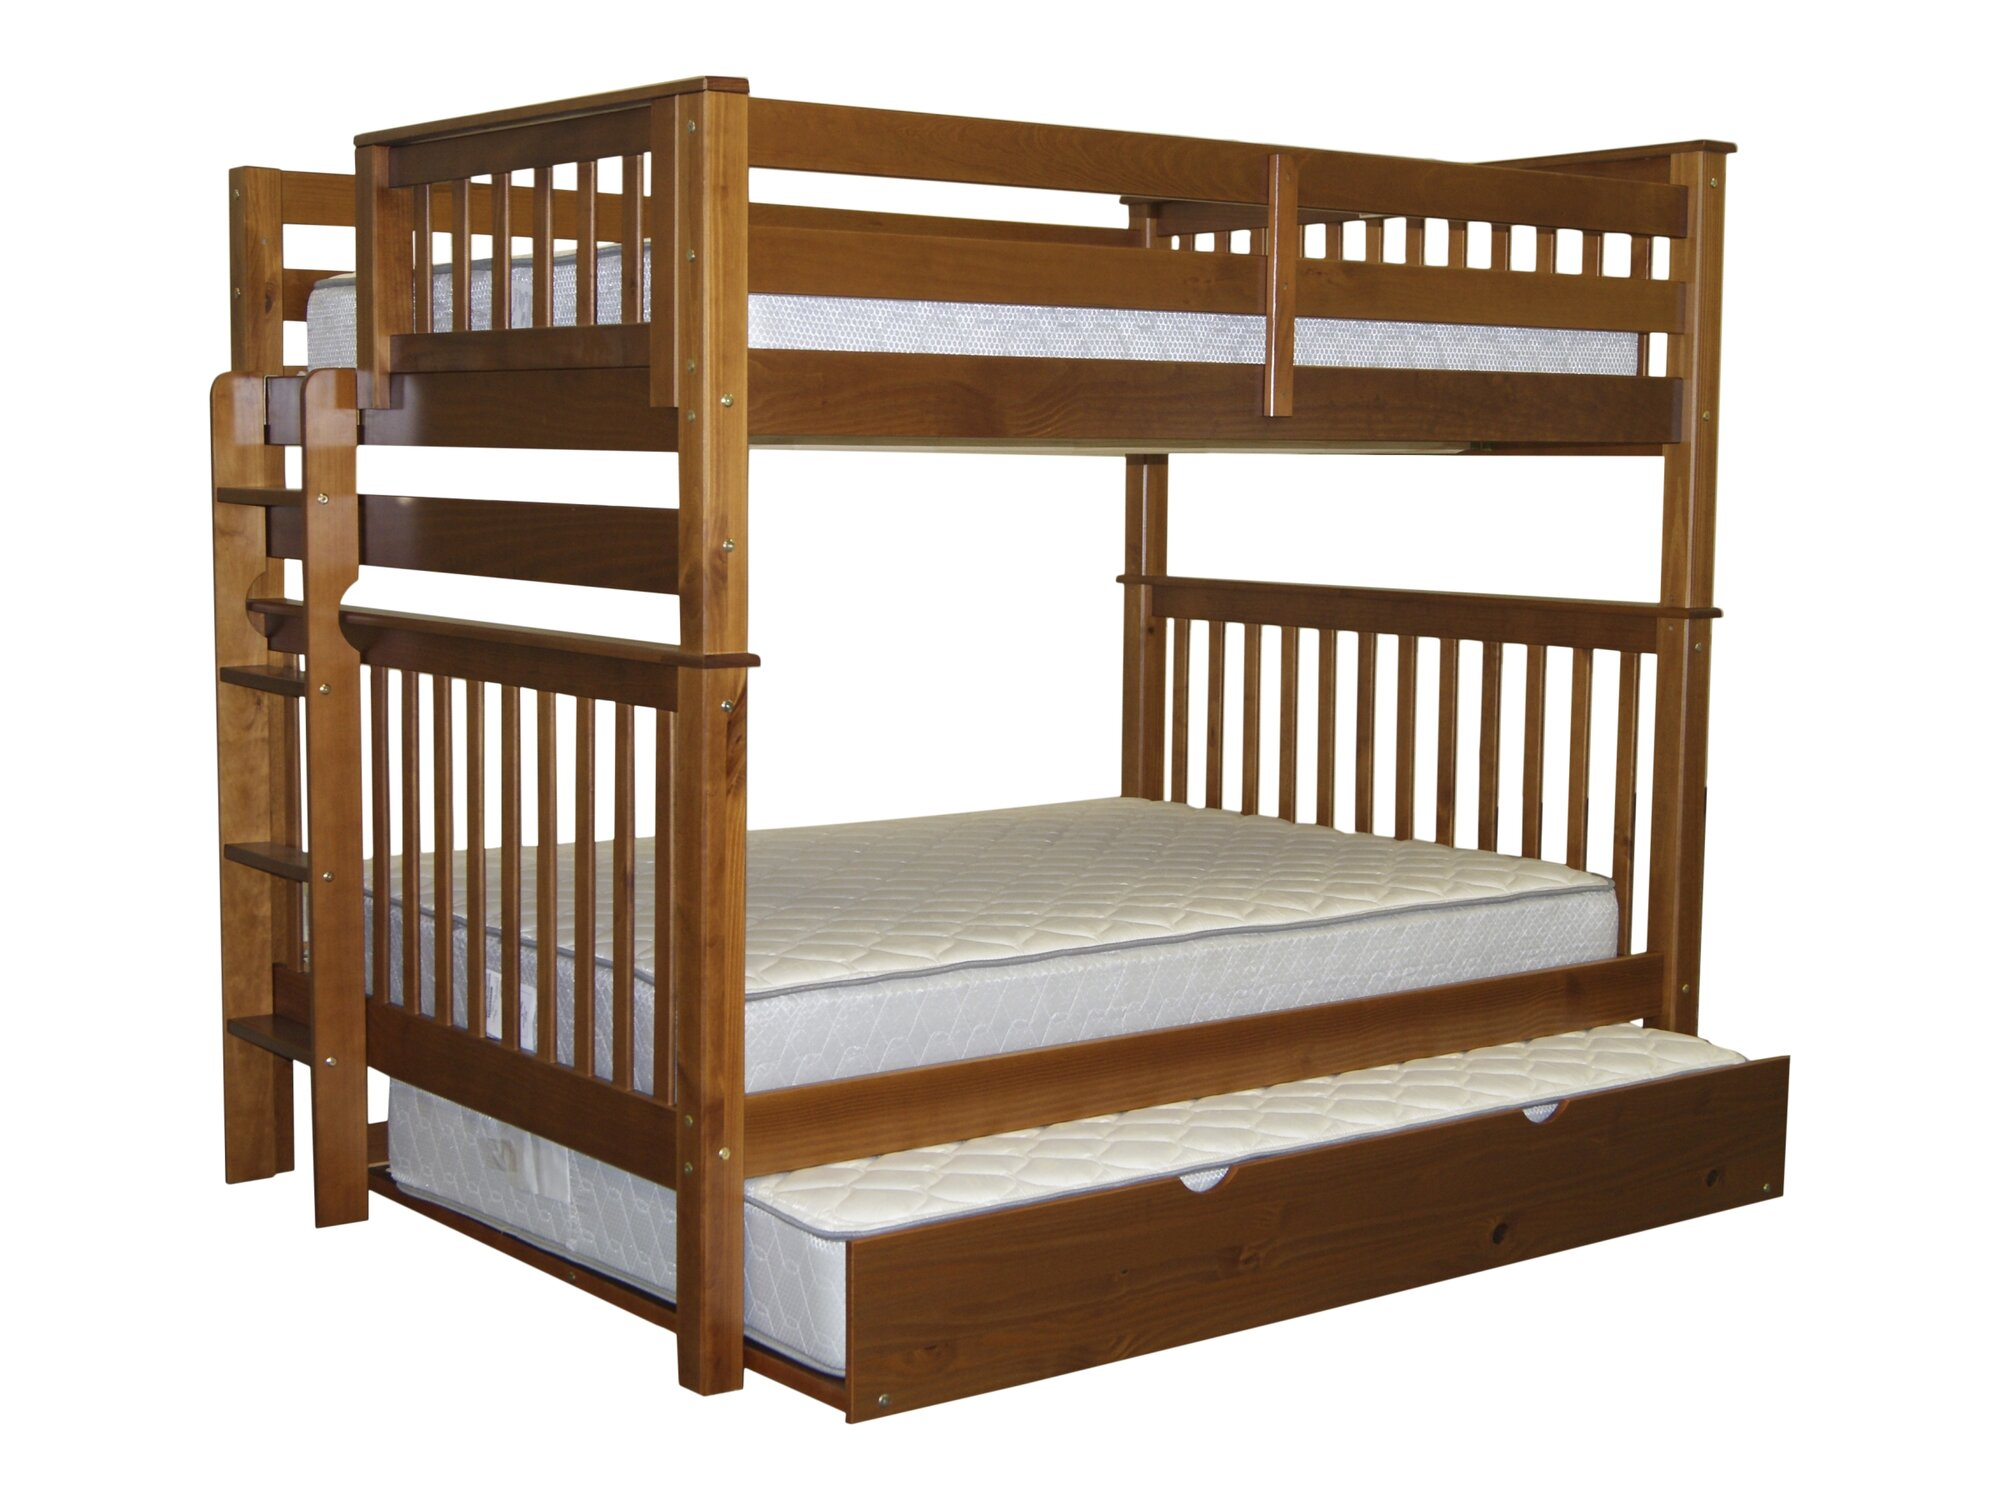 bedz king mission full over full bunk bed with trundle ebay. Black Bedroom Furniture Sets. Home Design Ideas